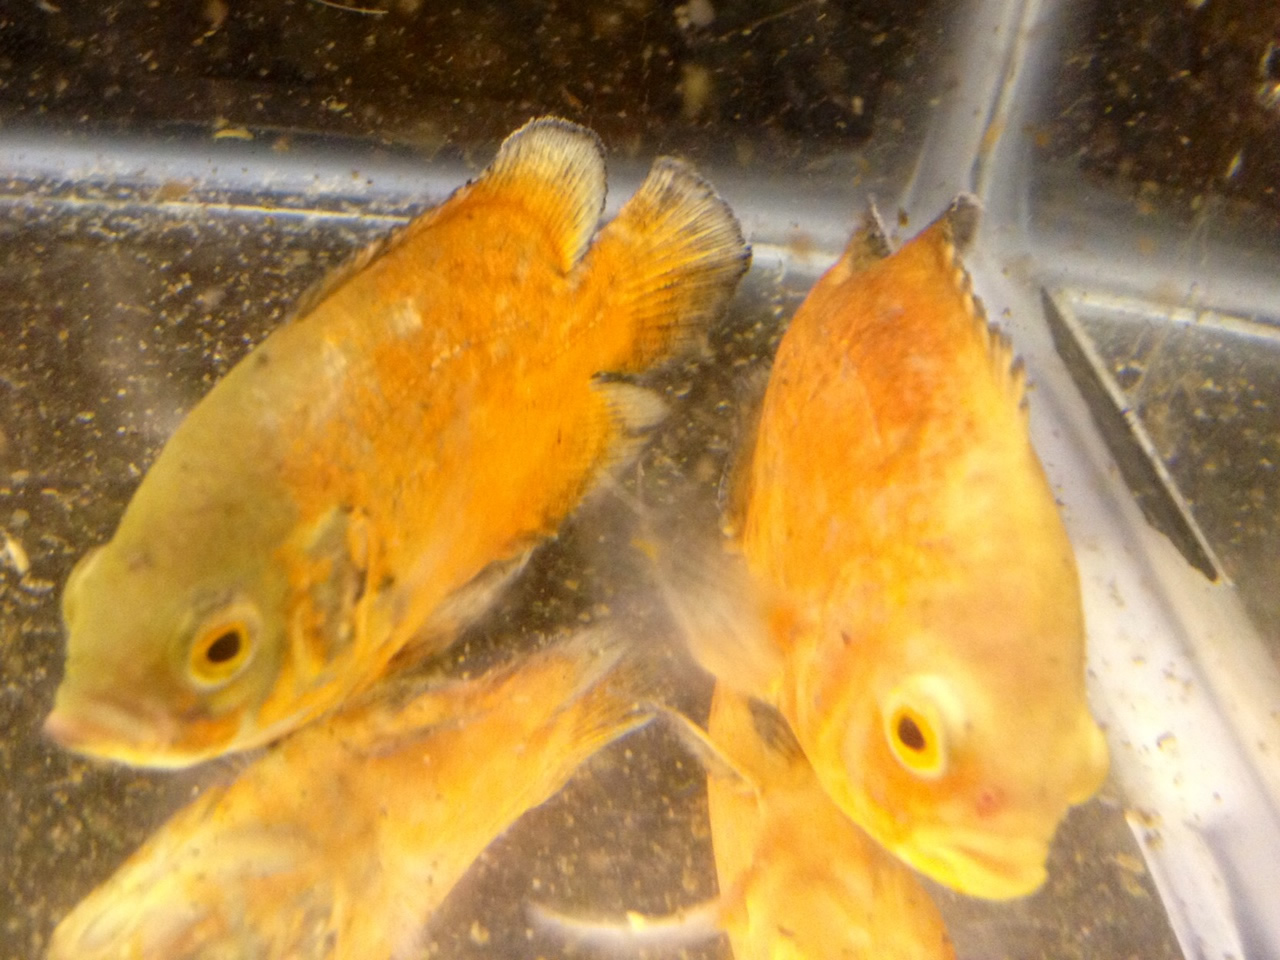 Solid tangerine orange oscar aquarium fish for sale for Archer fish for sale